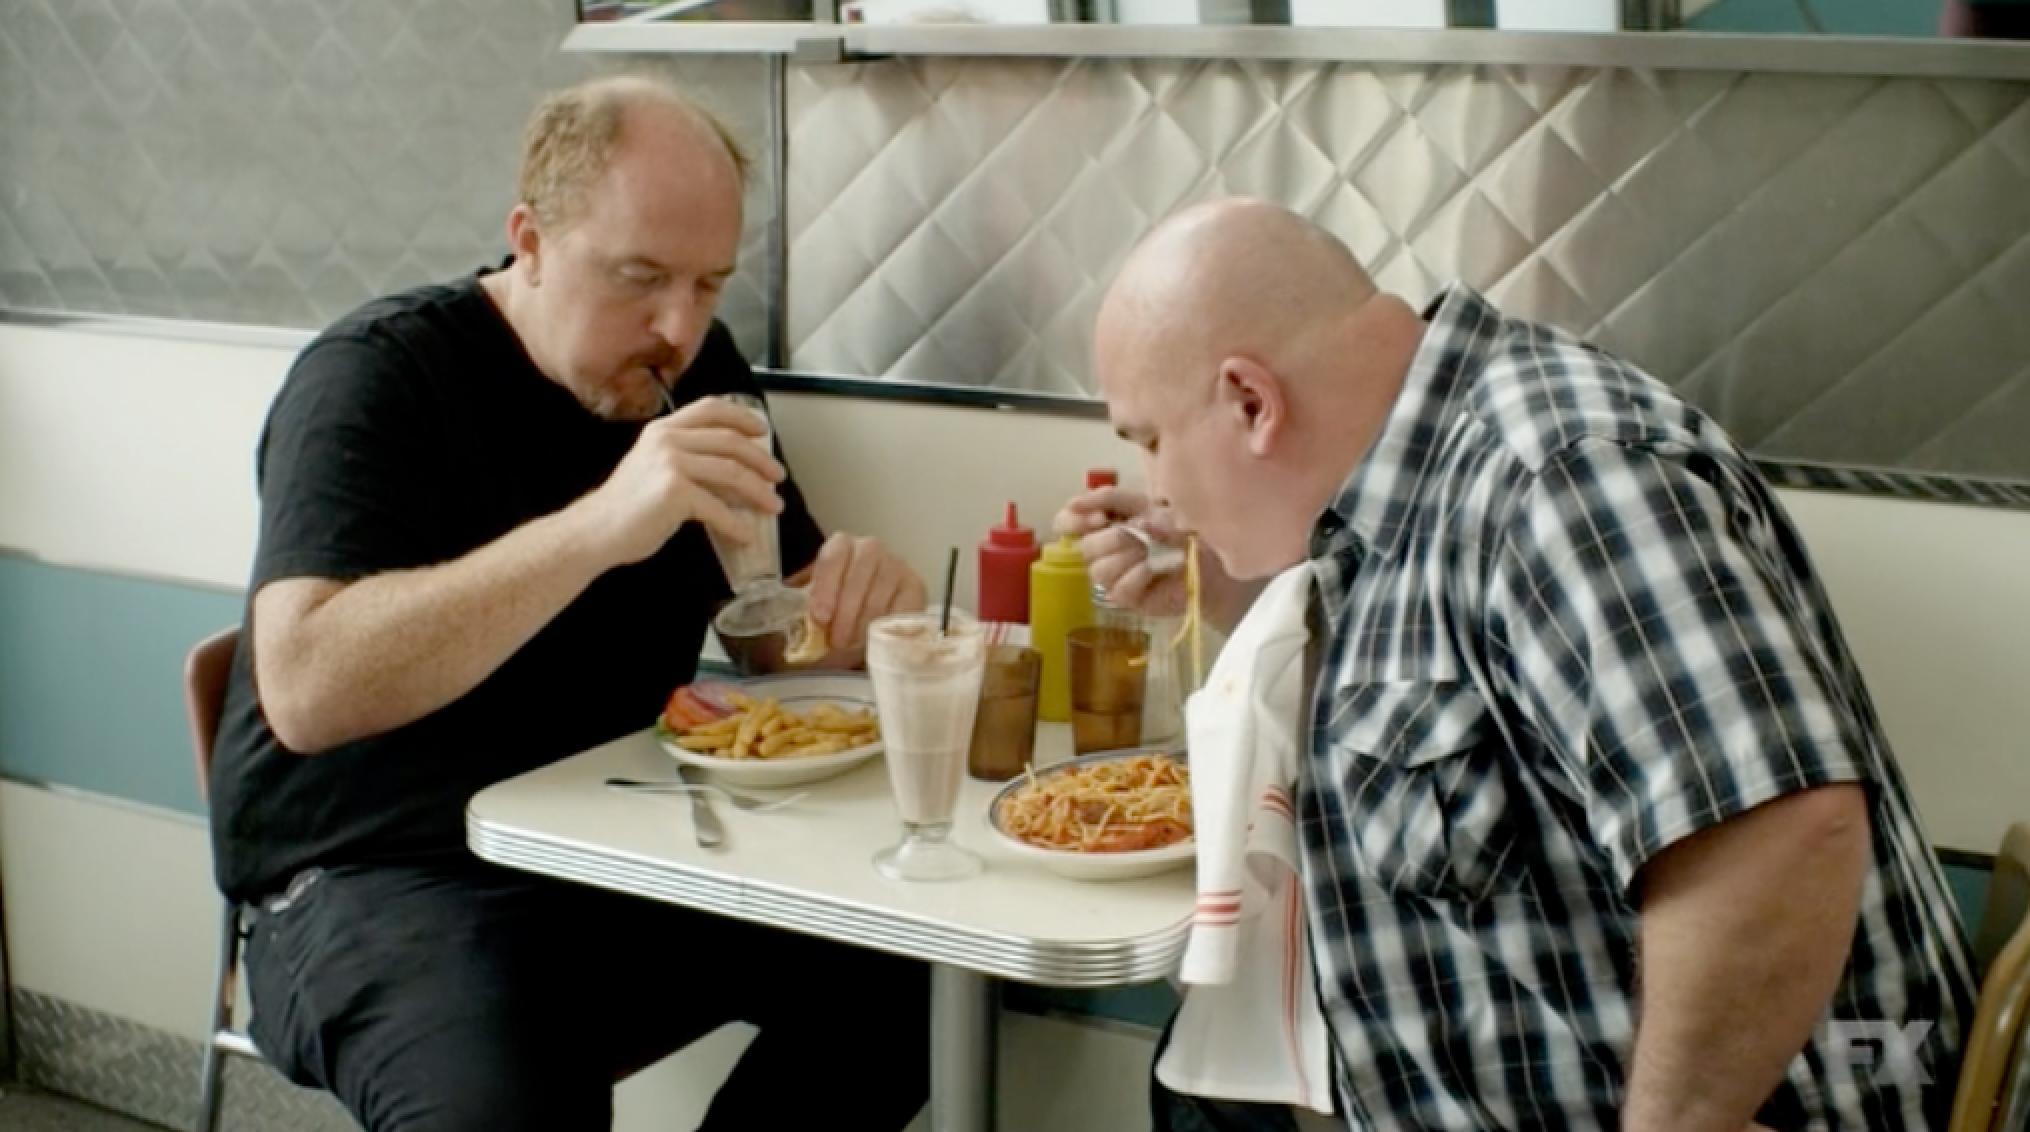 Watch Louis C.K. Eat a Double Dinner, AKA a 'Bang-Bang'